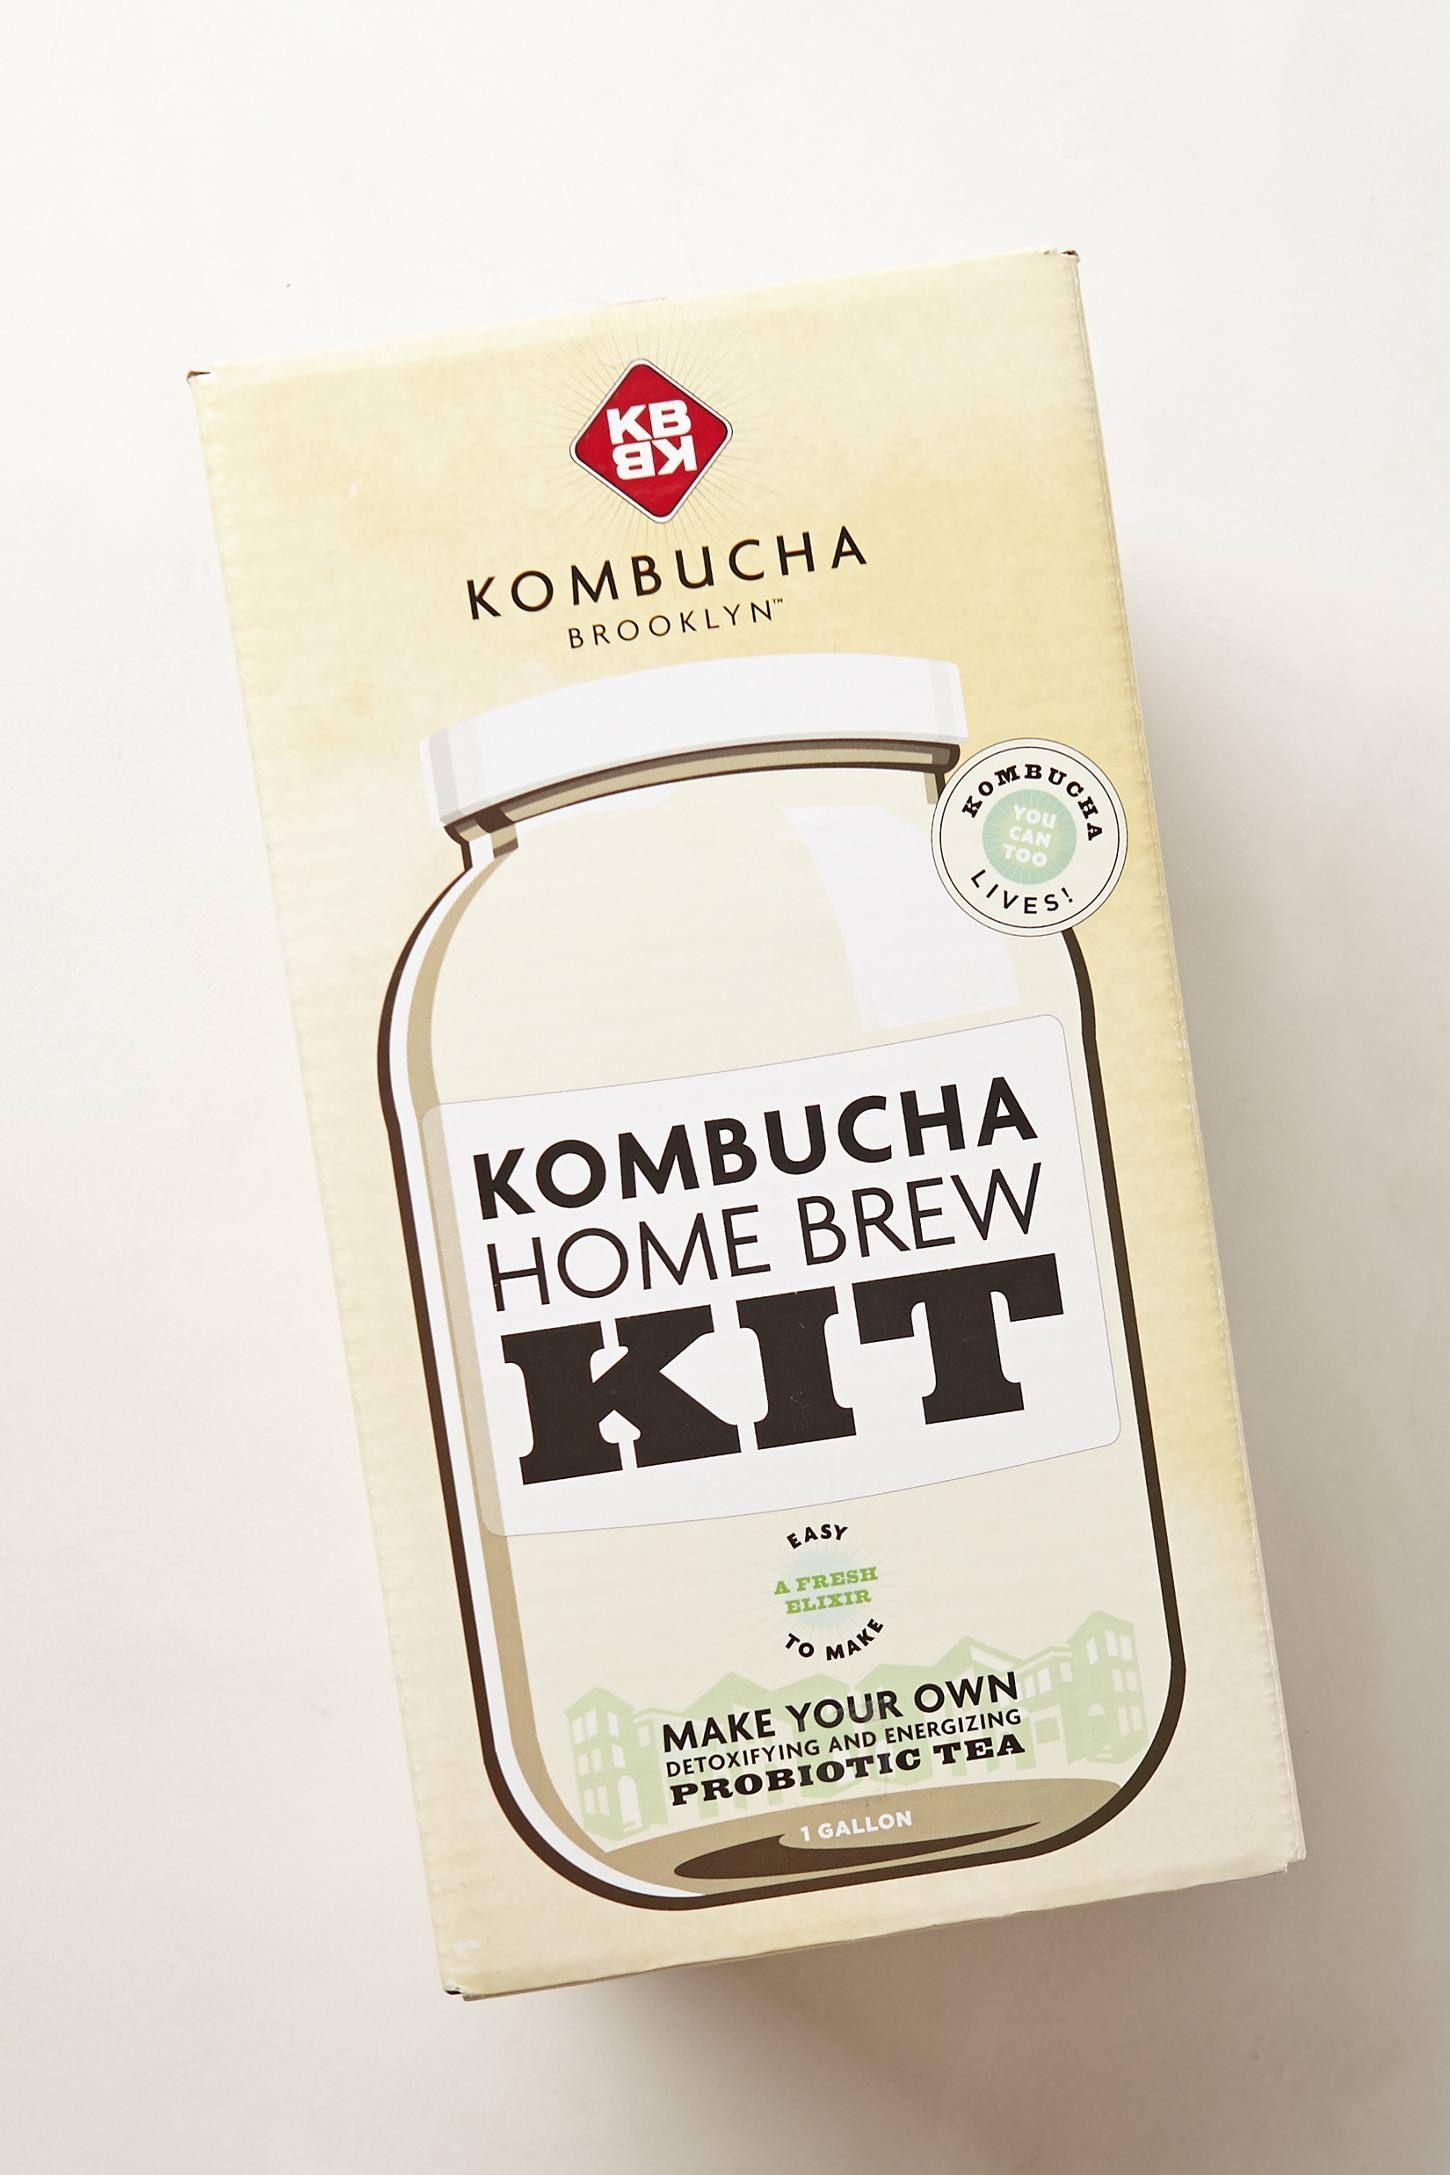 KBBK Kombucha Home Brew Kit - anthropologie.com | I have an idea ...